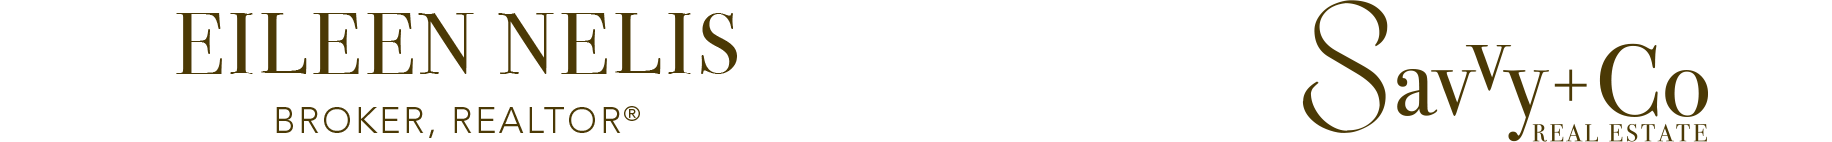 Eileen Nelis, Broker, REALTOR® Logo